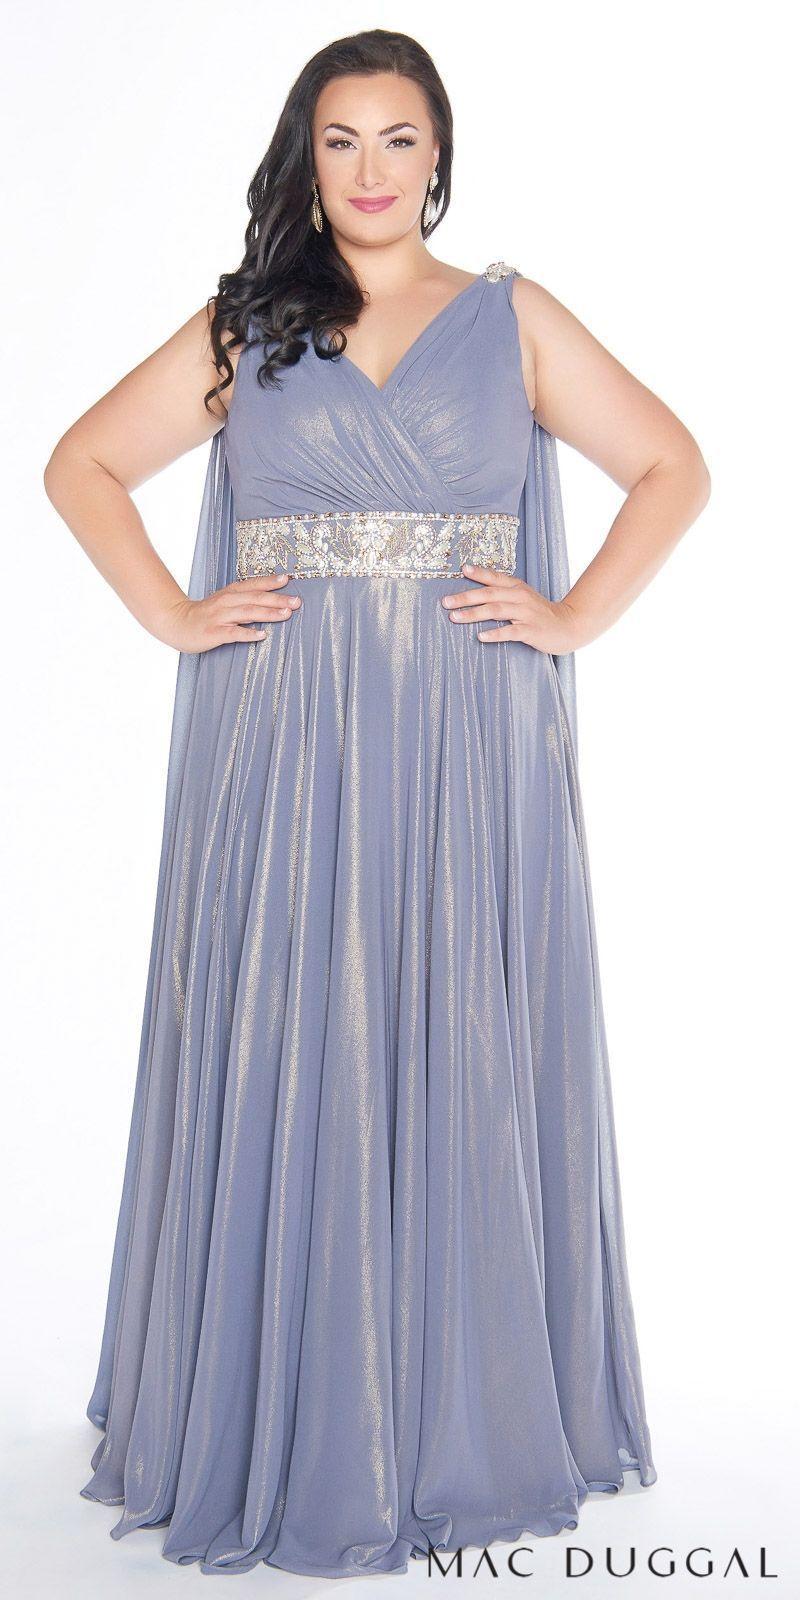 Sleeveless Iridescent Embellished Plus Size Evening Dress by Mac